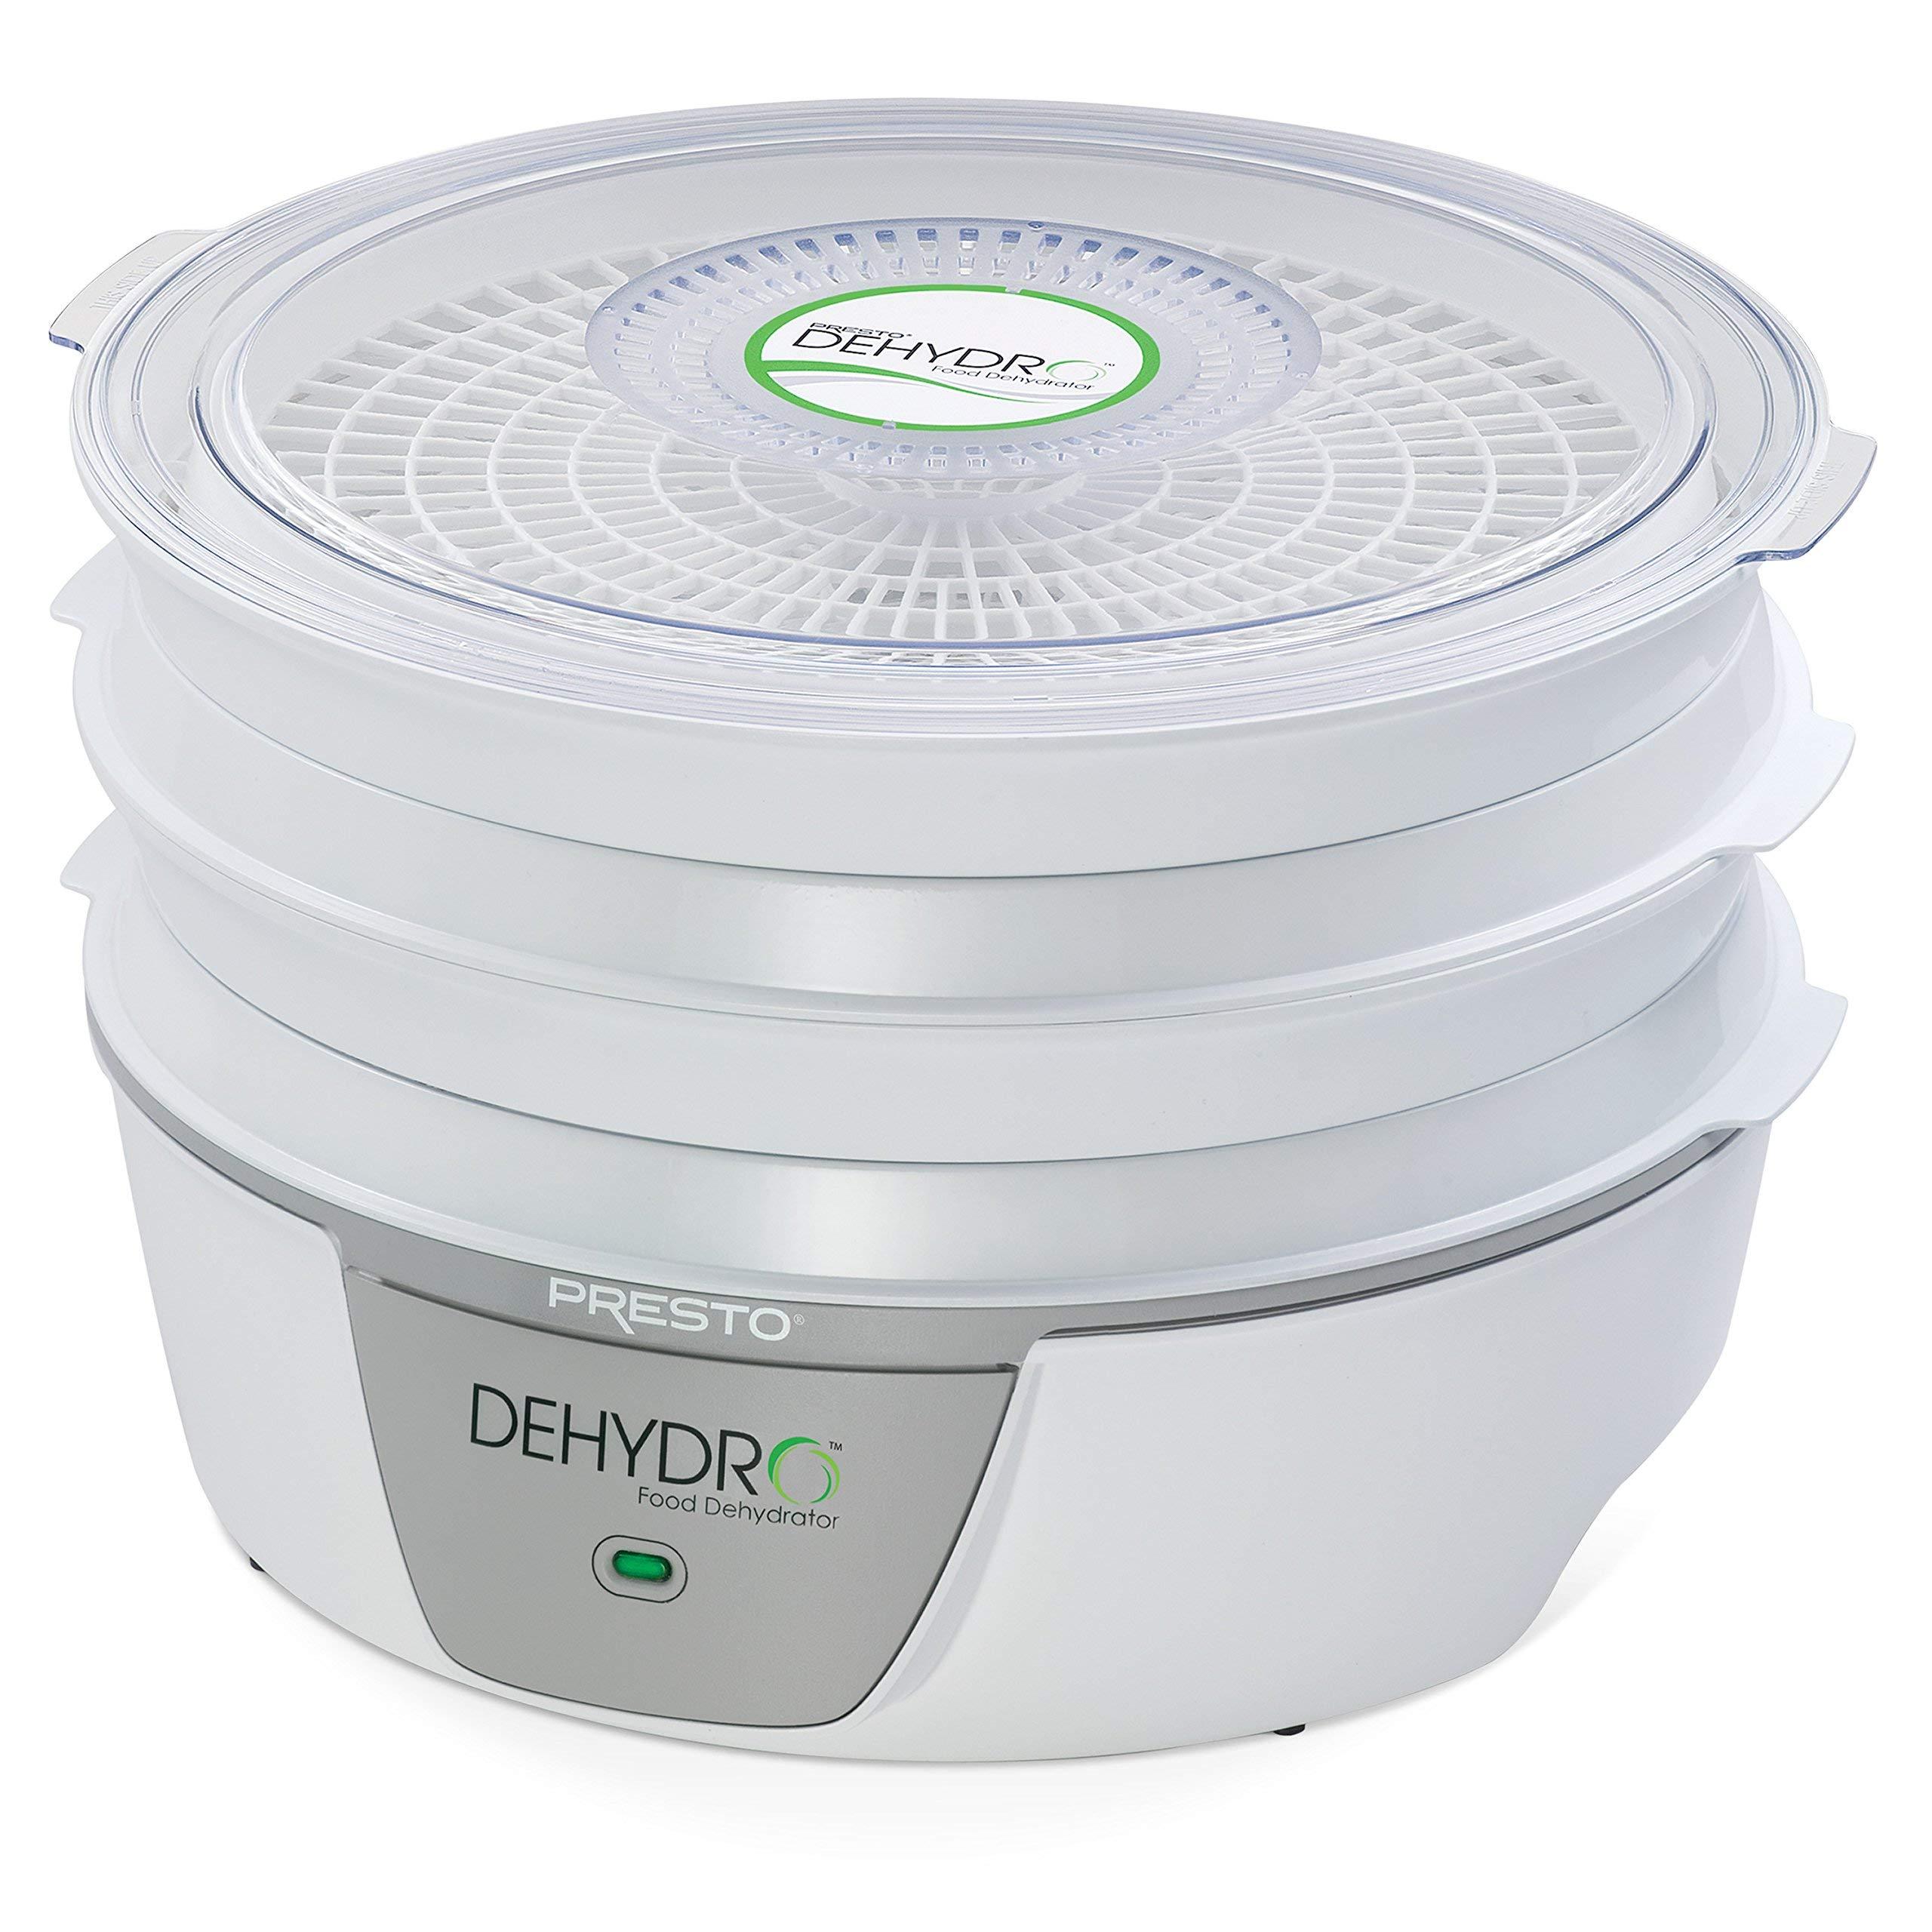 Presto 06300 Dehydro Electric Food Dehydrator (Renewed) by Presto